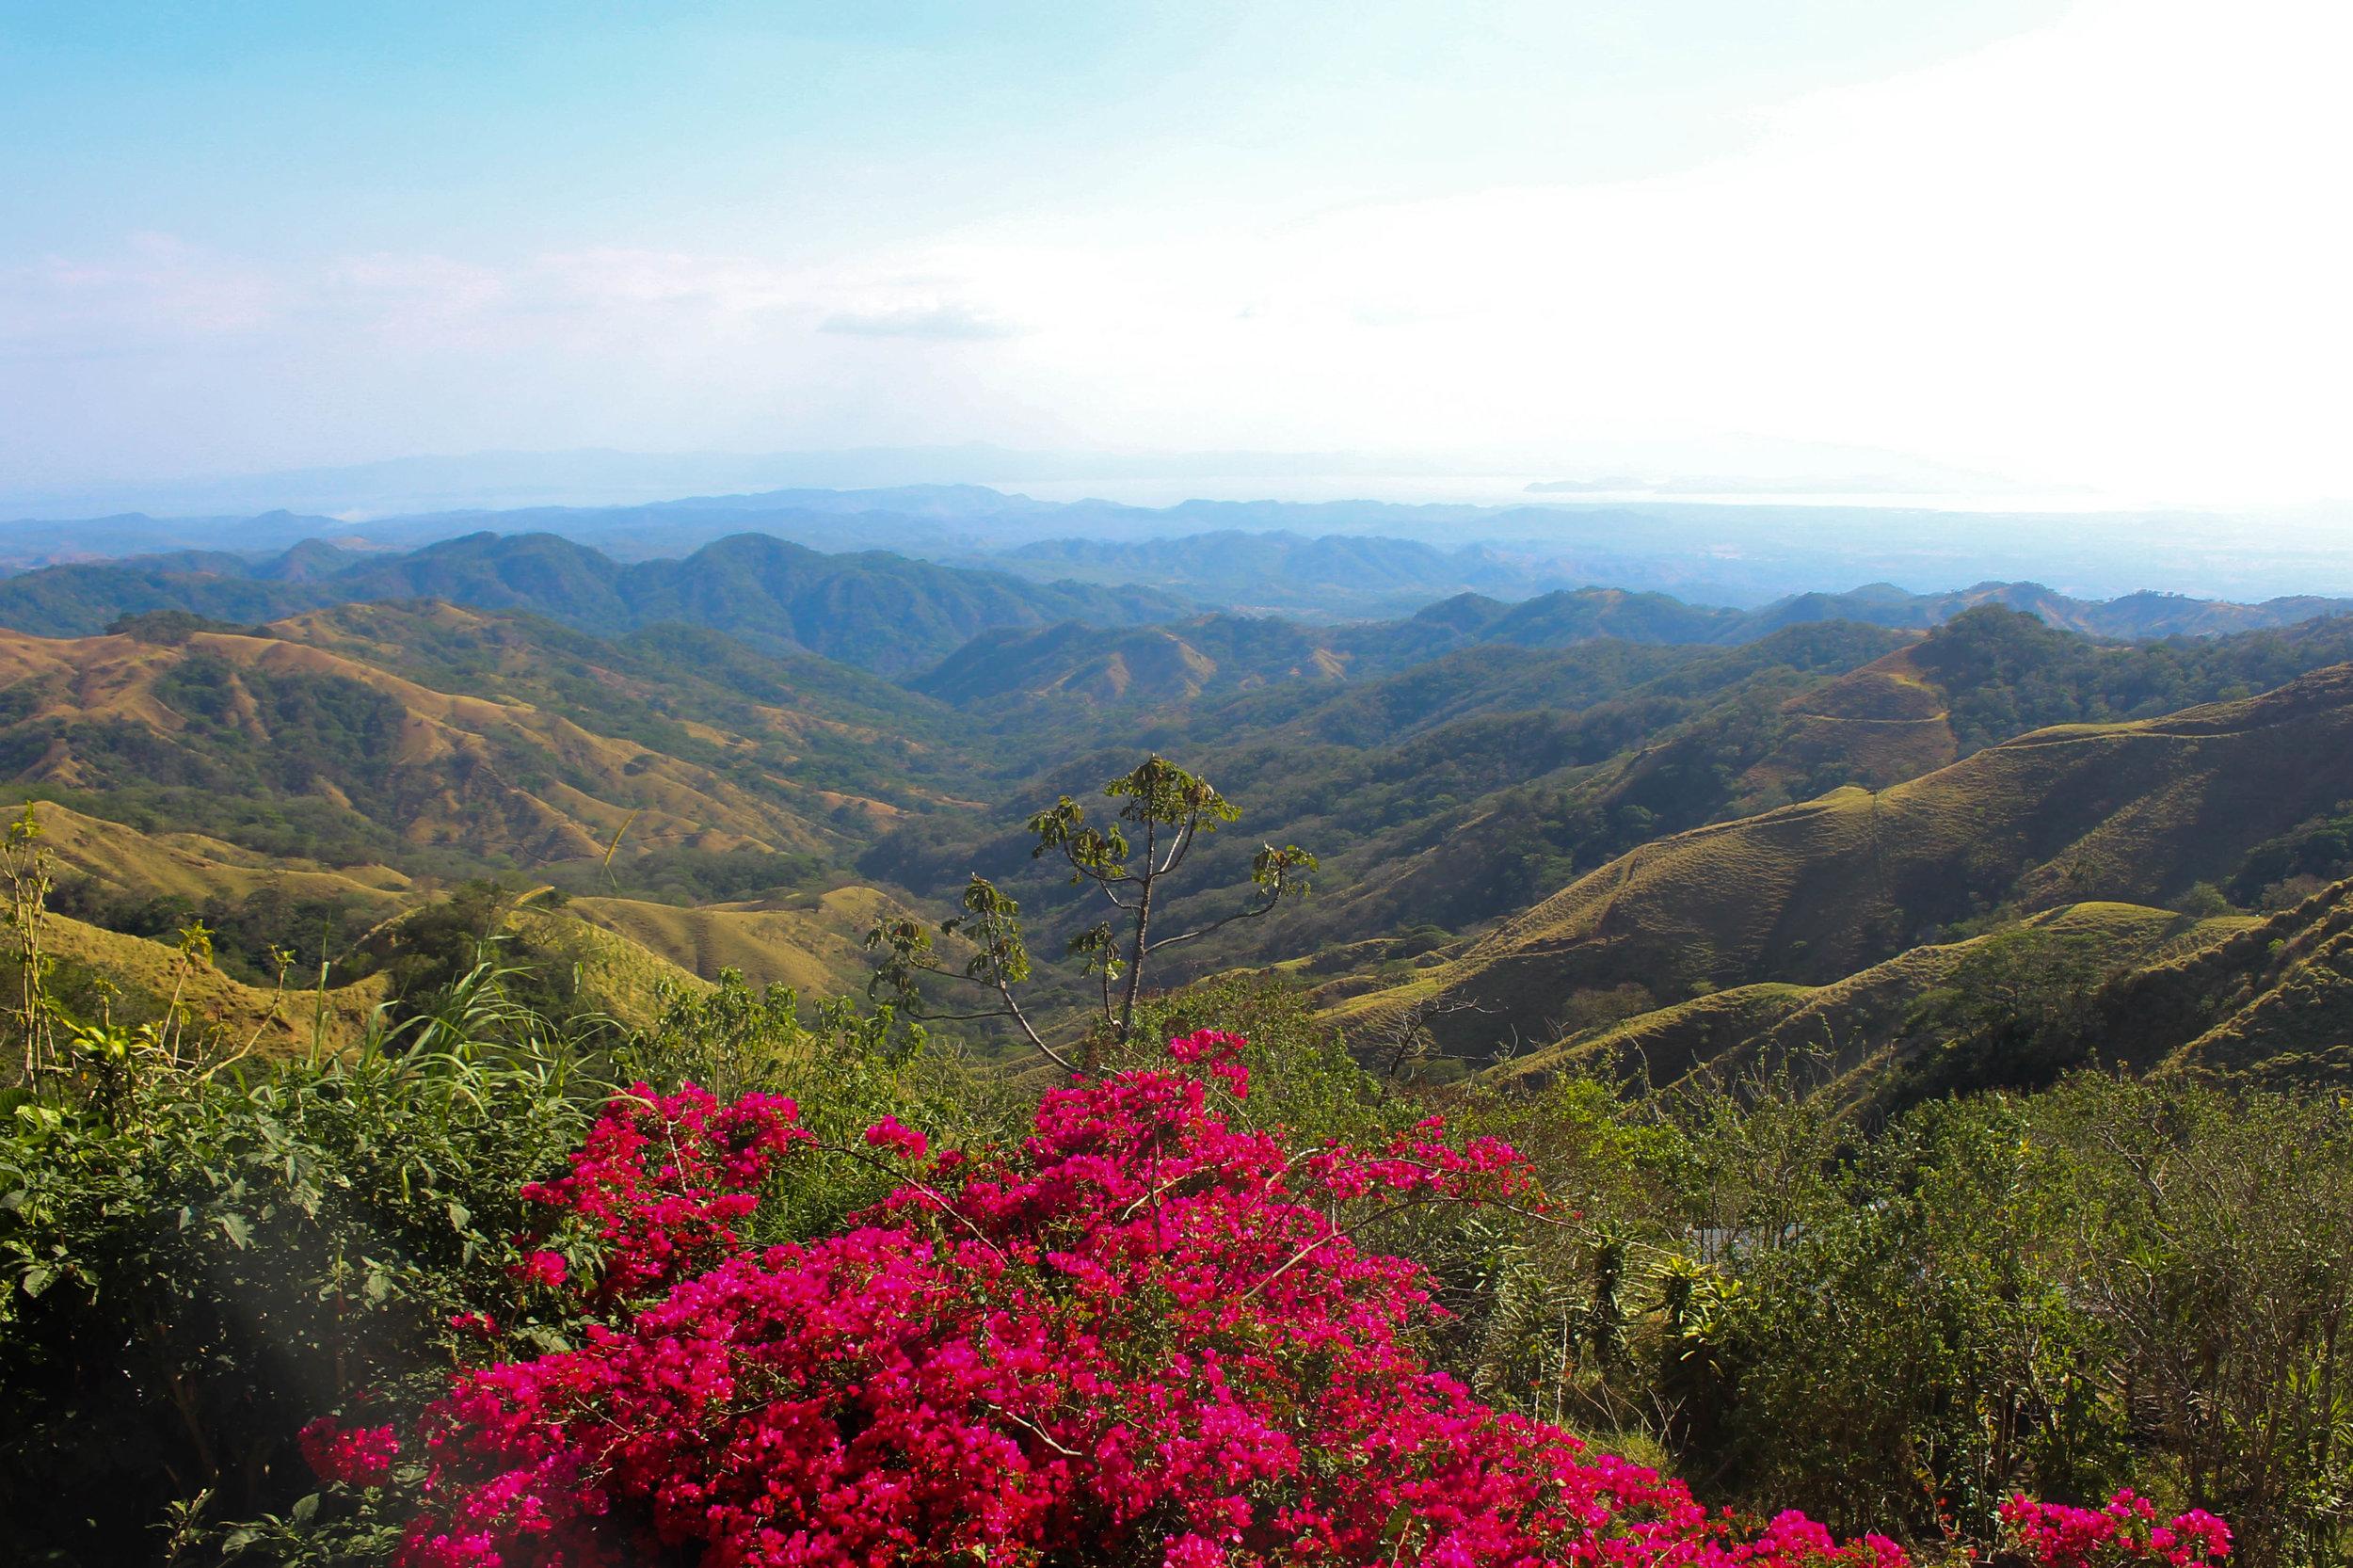 Views from Coffee Plantation